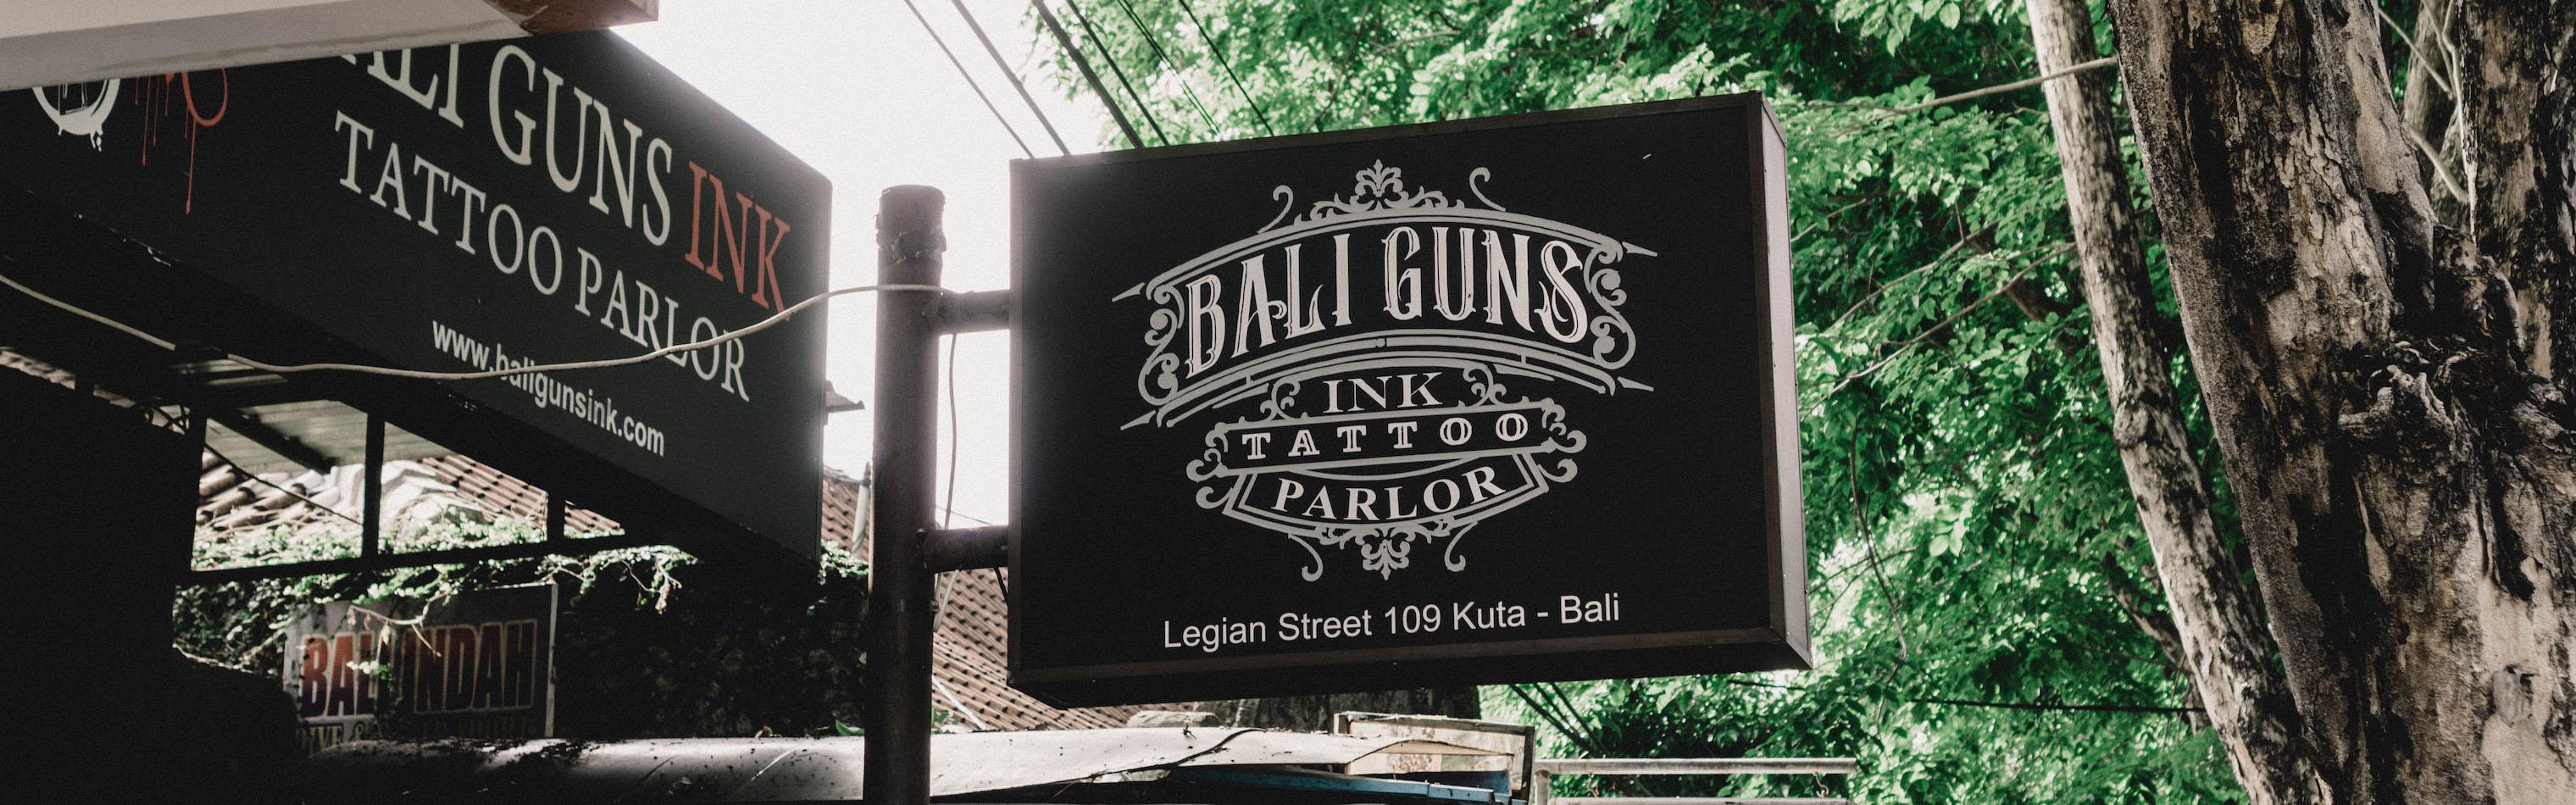 Bali Guns Ink Tattoo Parlor